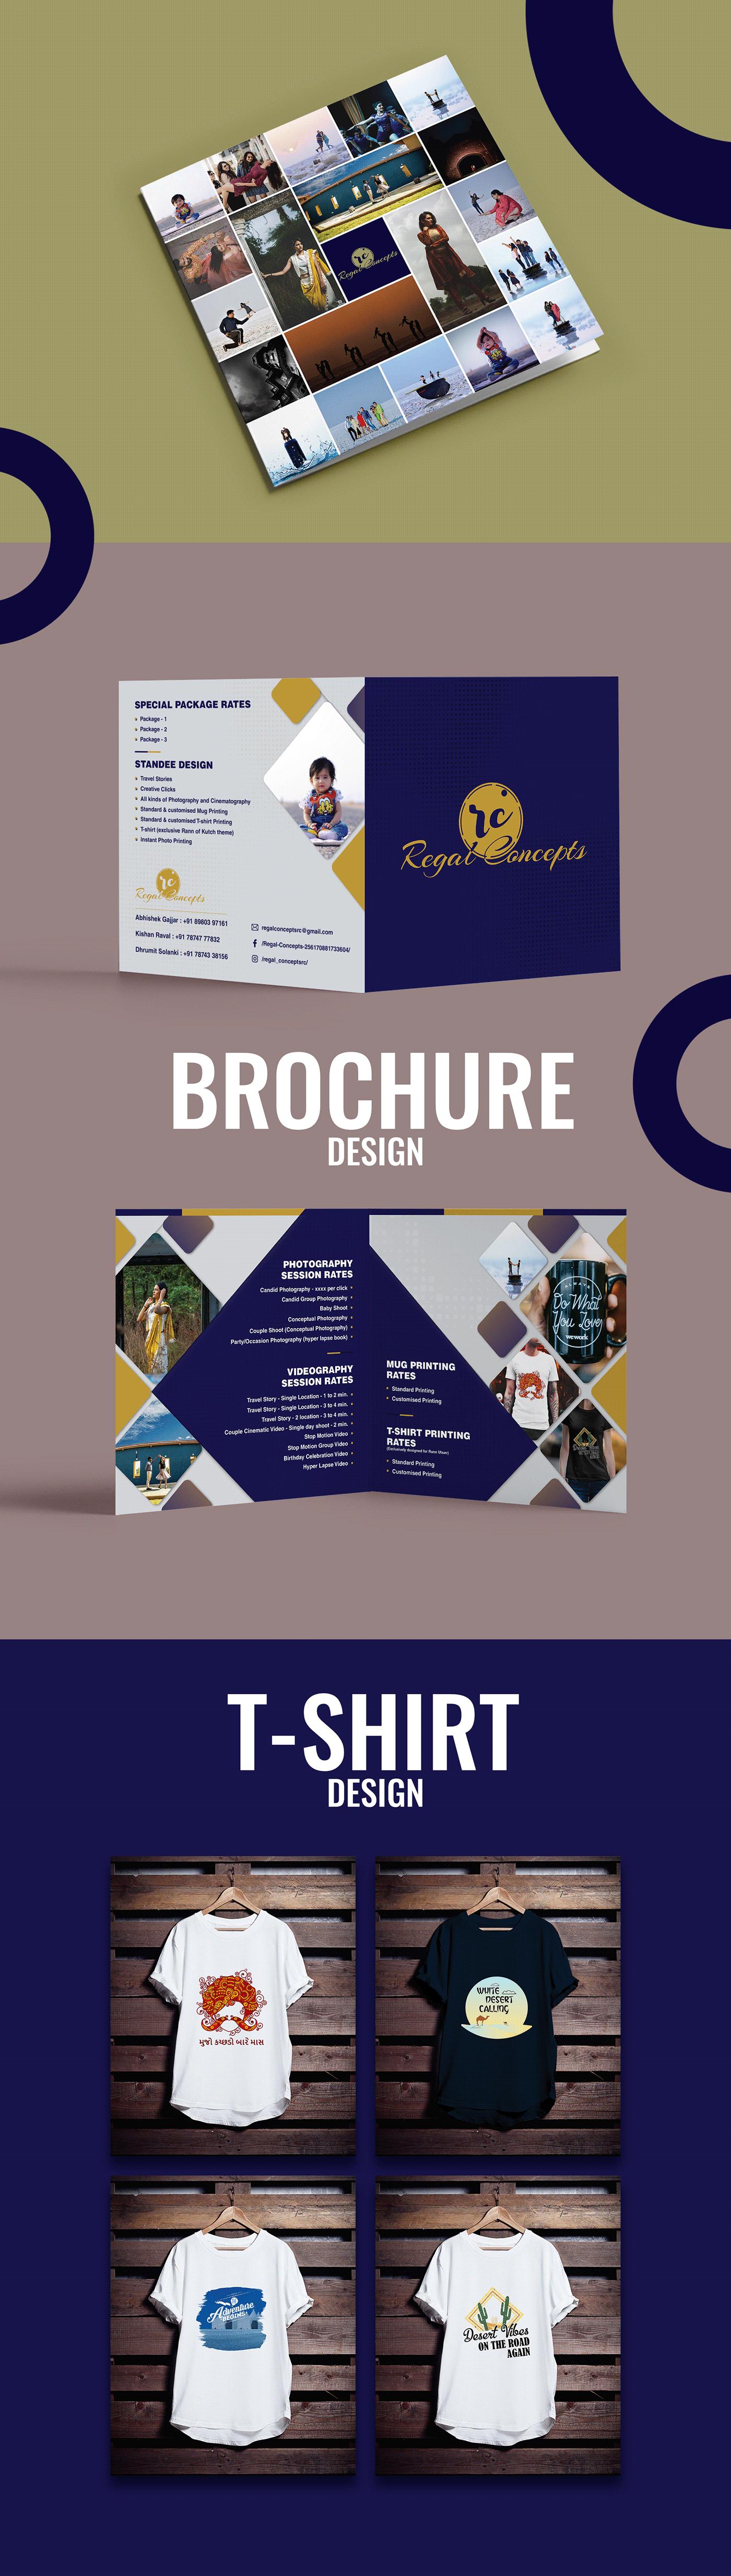 brochuredesign design graphicdesign T-Shirtdesign